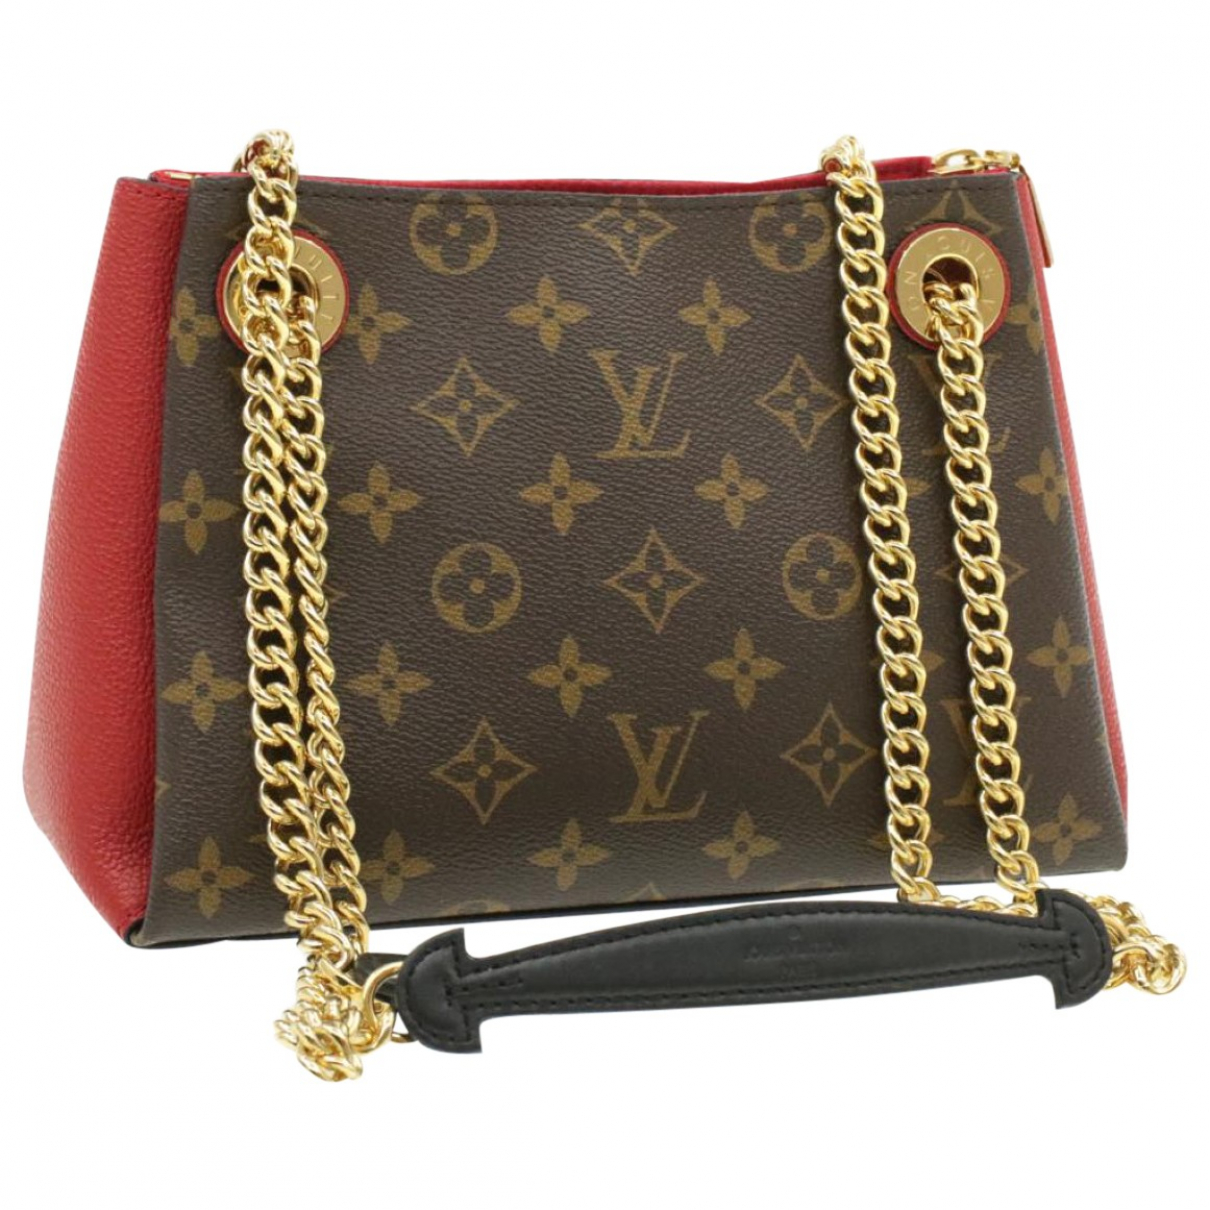 Bolso Surene BB de Lona Louis Vuitton